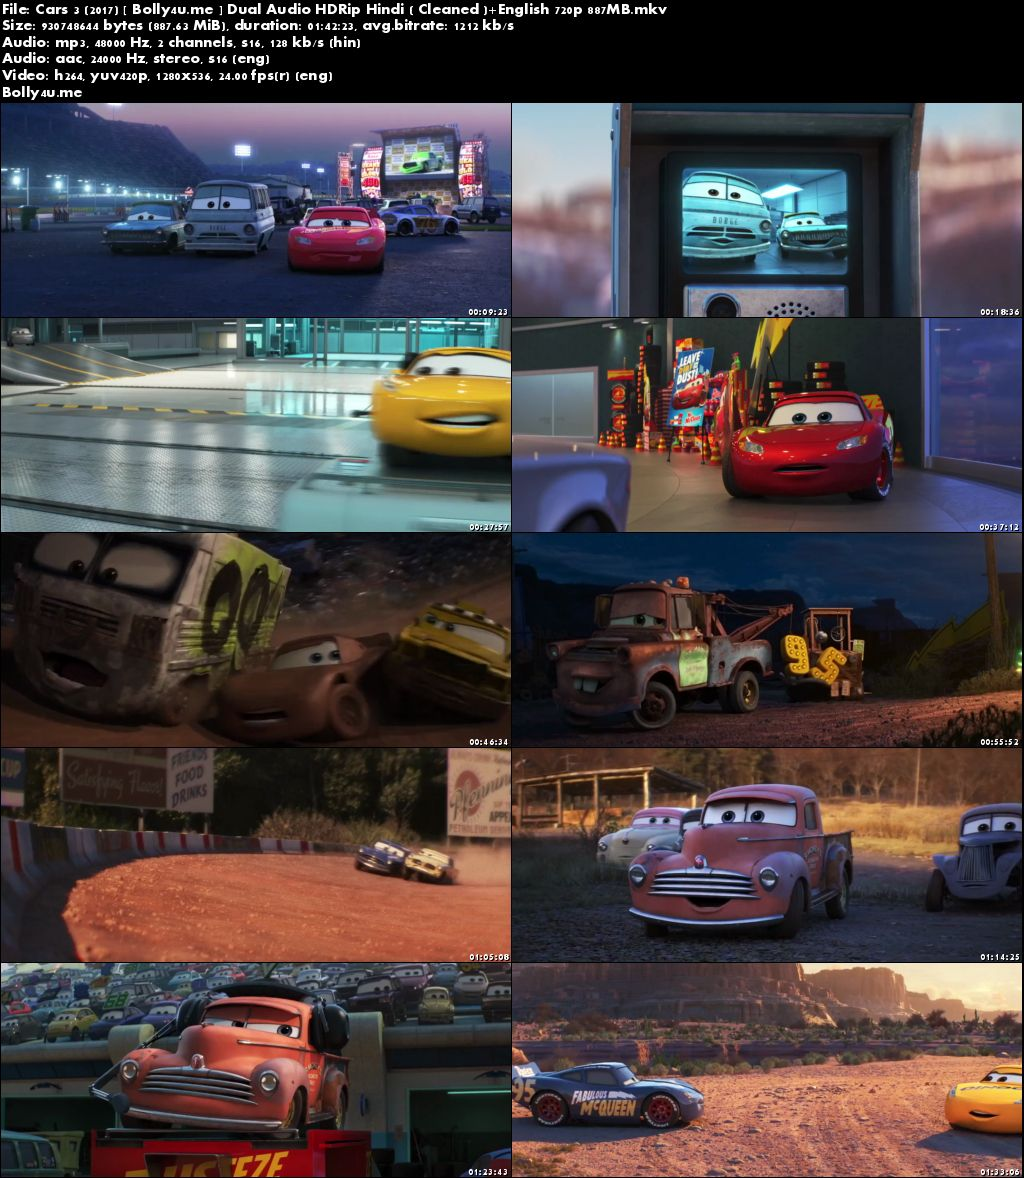 Cars 3 2017 HDRip 300MB Hindi Dual Audio 480p Download